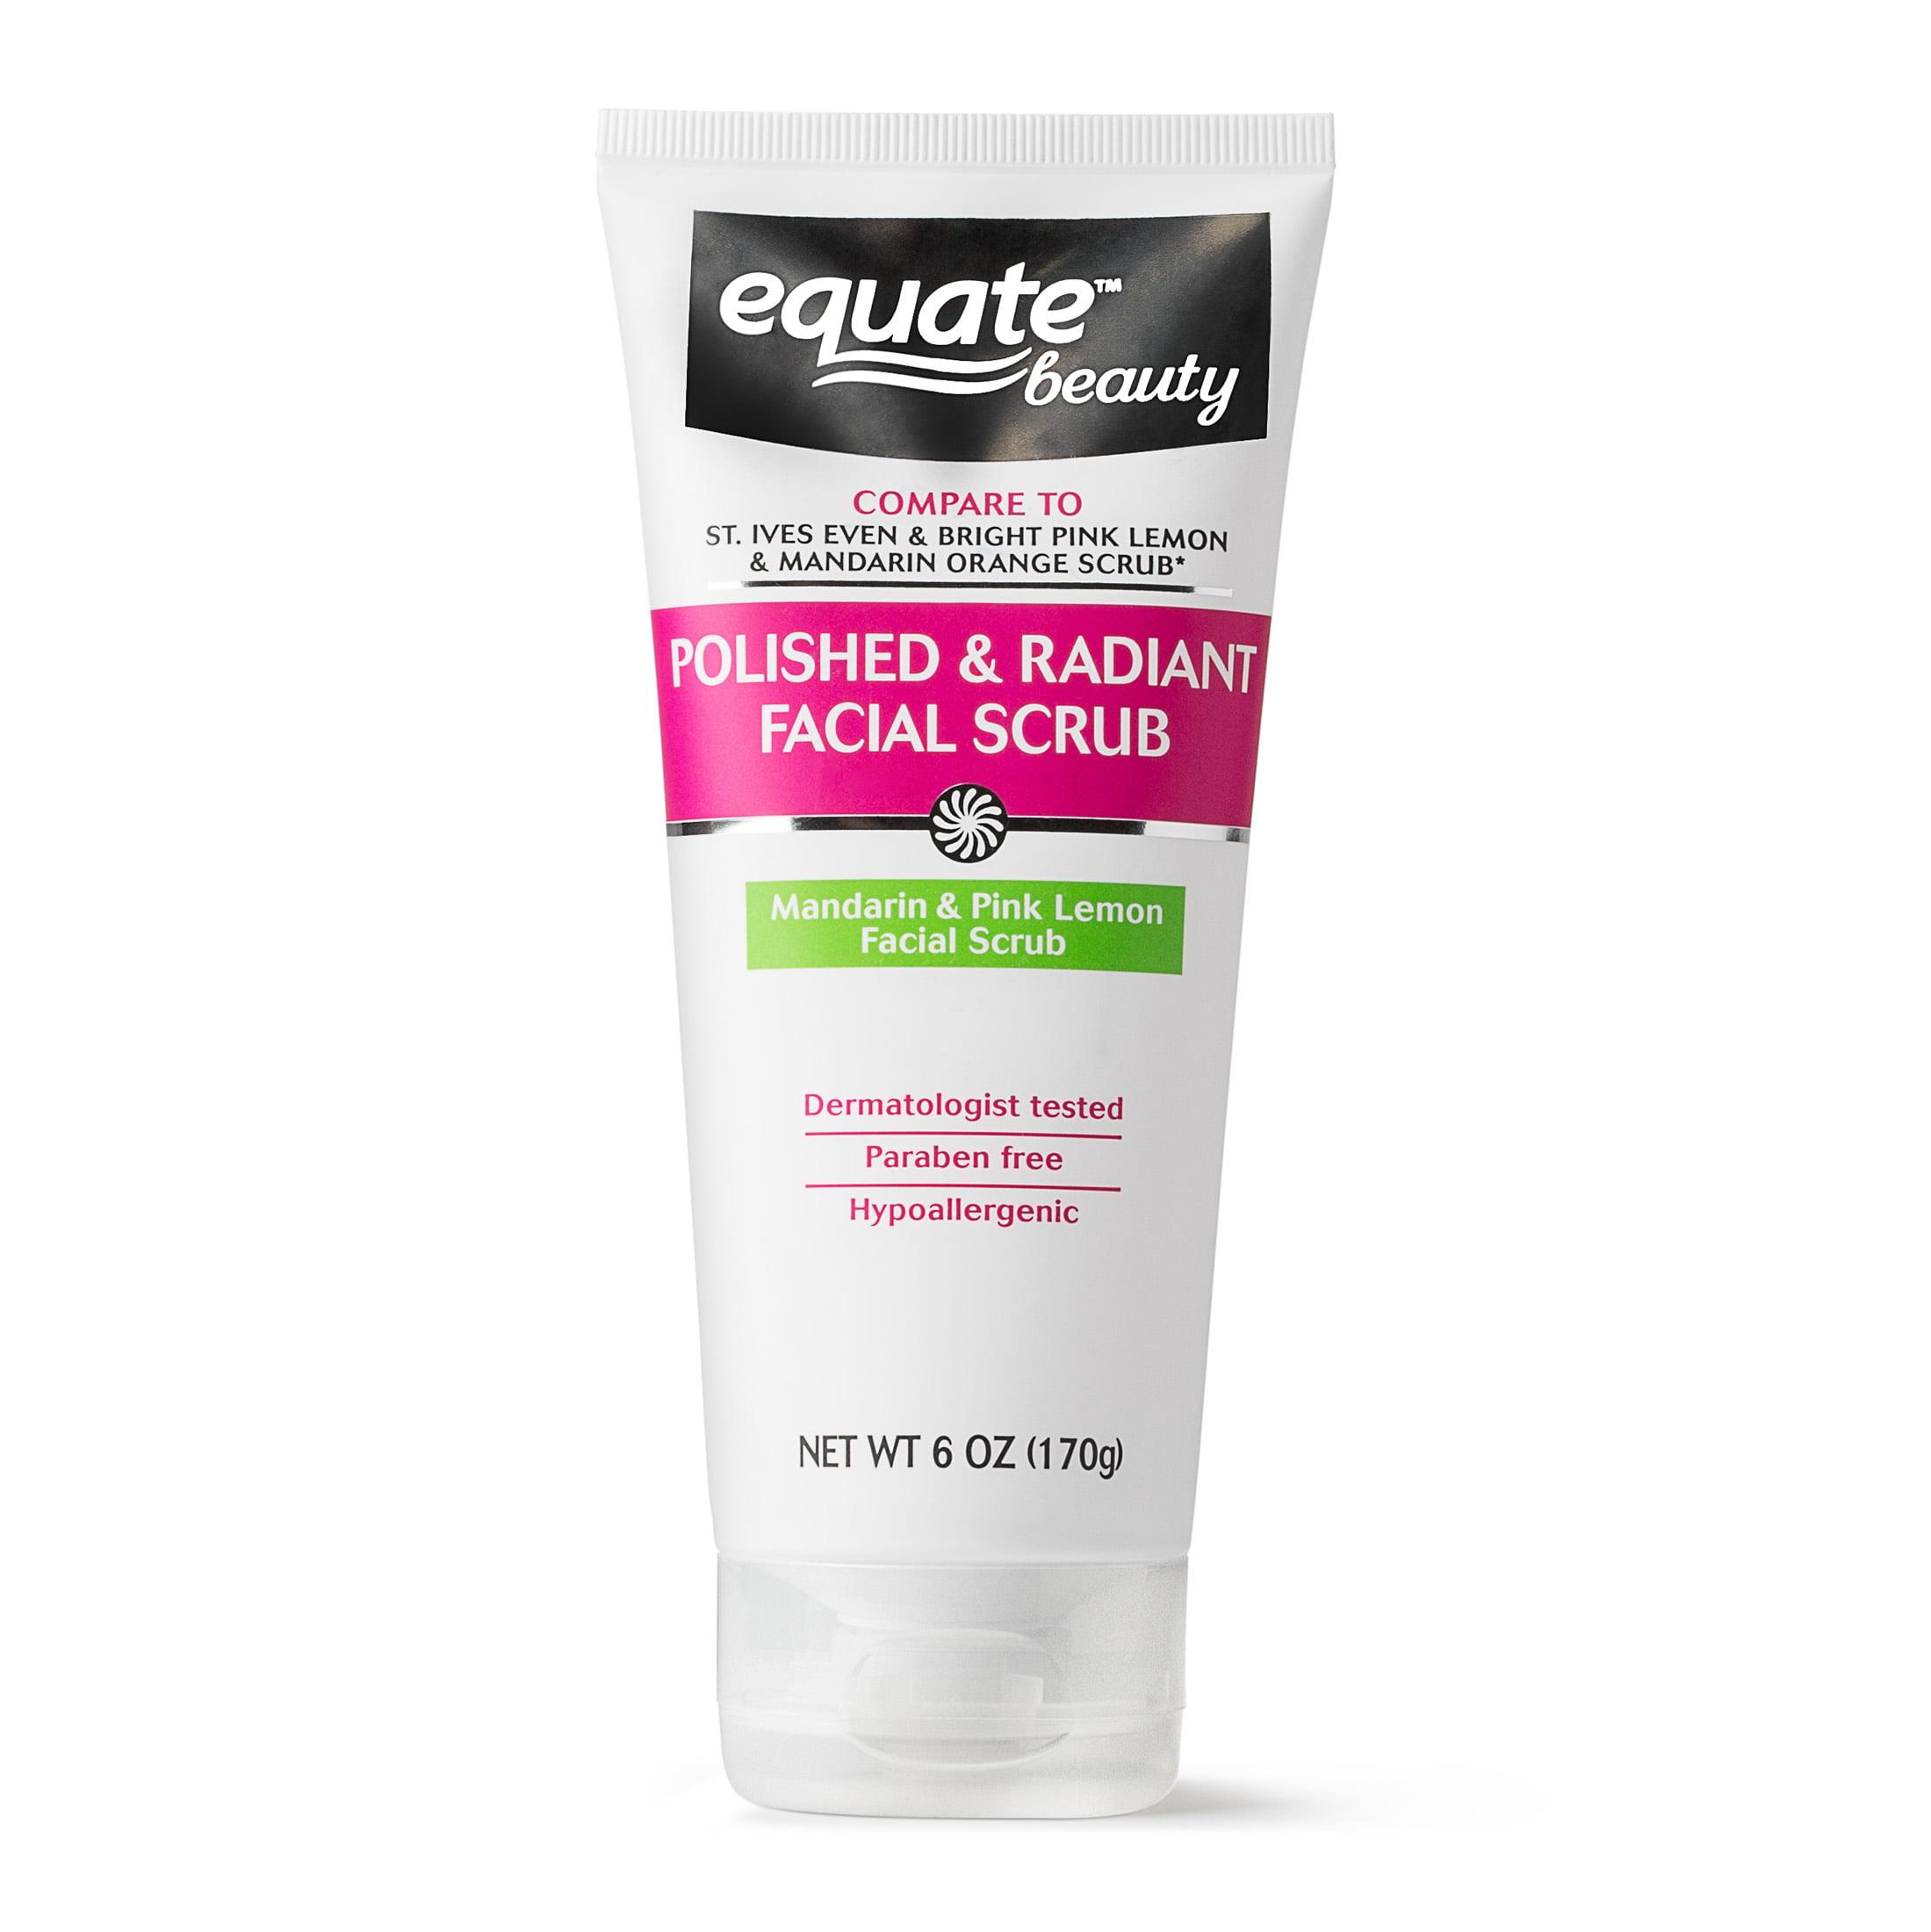 Equate Beauty Polished Radiant Facial Scrub Orange Pink Lemon